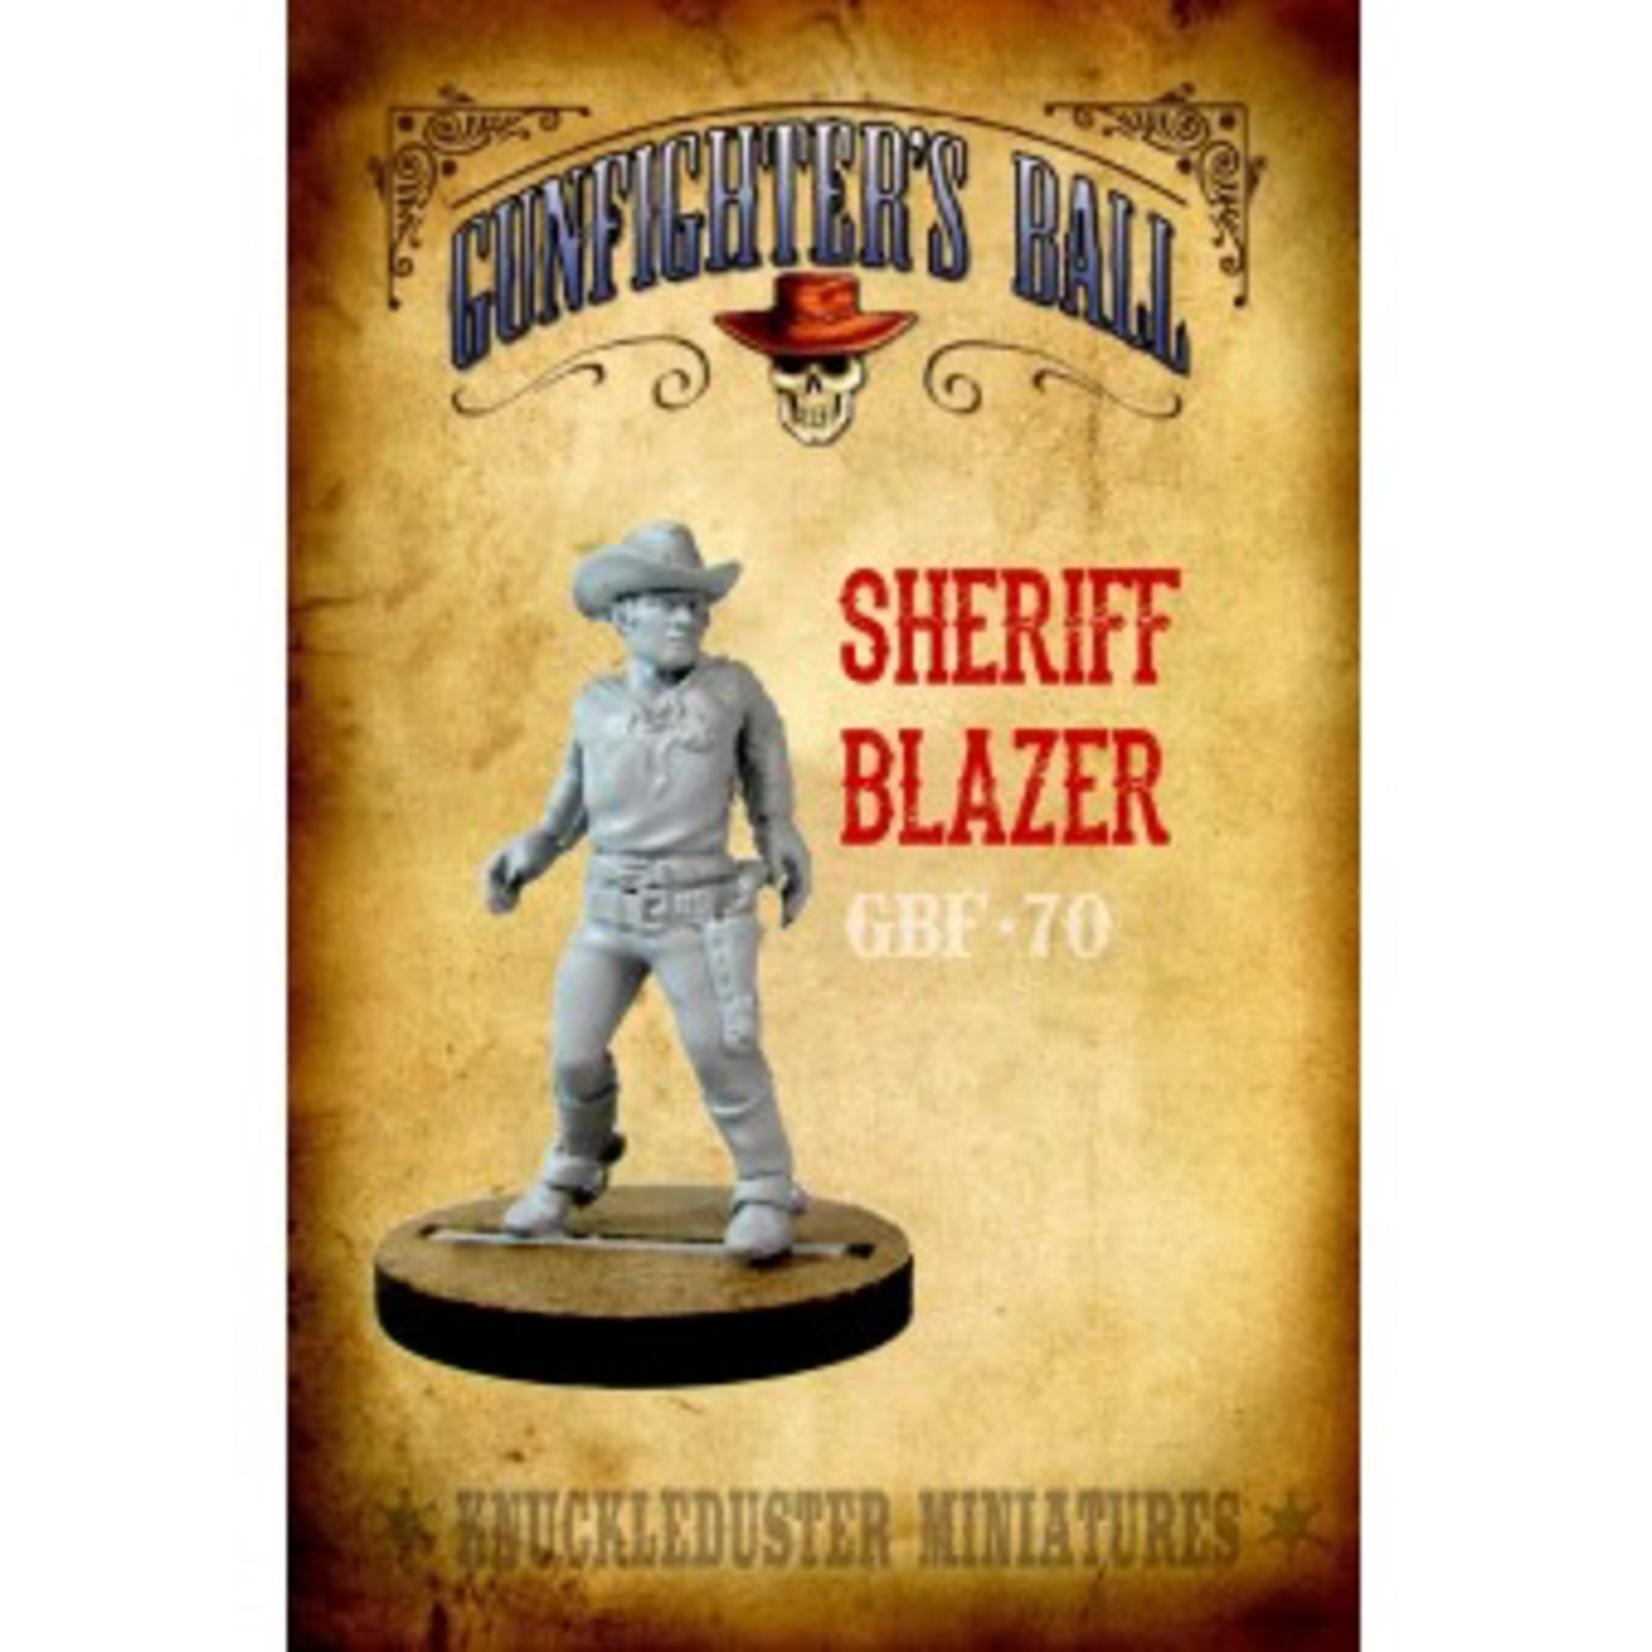 Sheriff Blazer